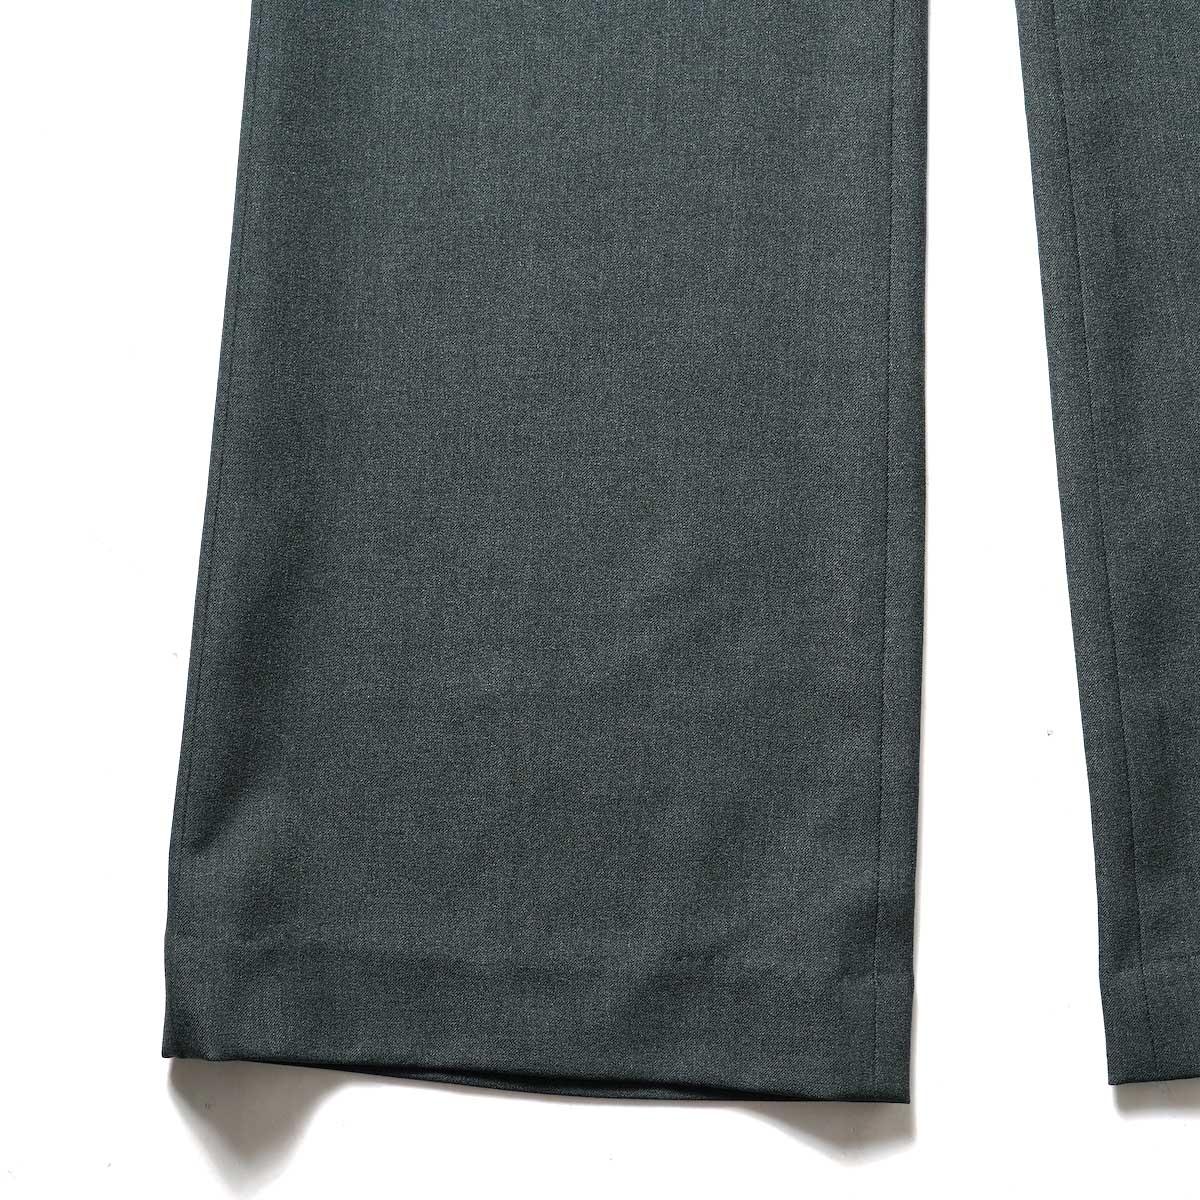 N.HOOLYWOOD / 2212-PT21-008 Flair Slacks (Charcoal)裾